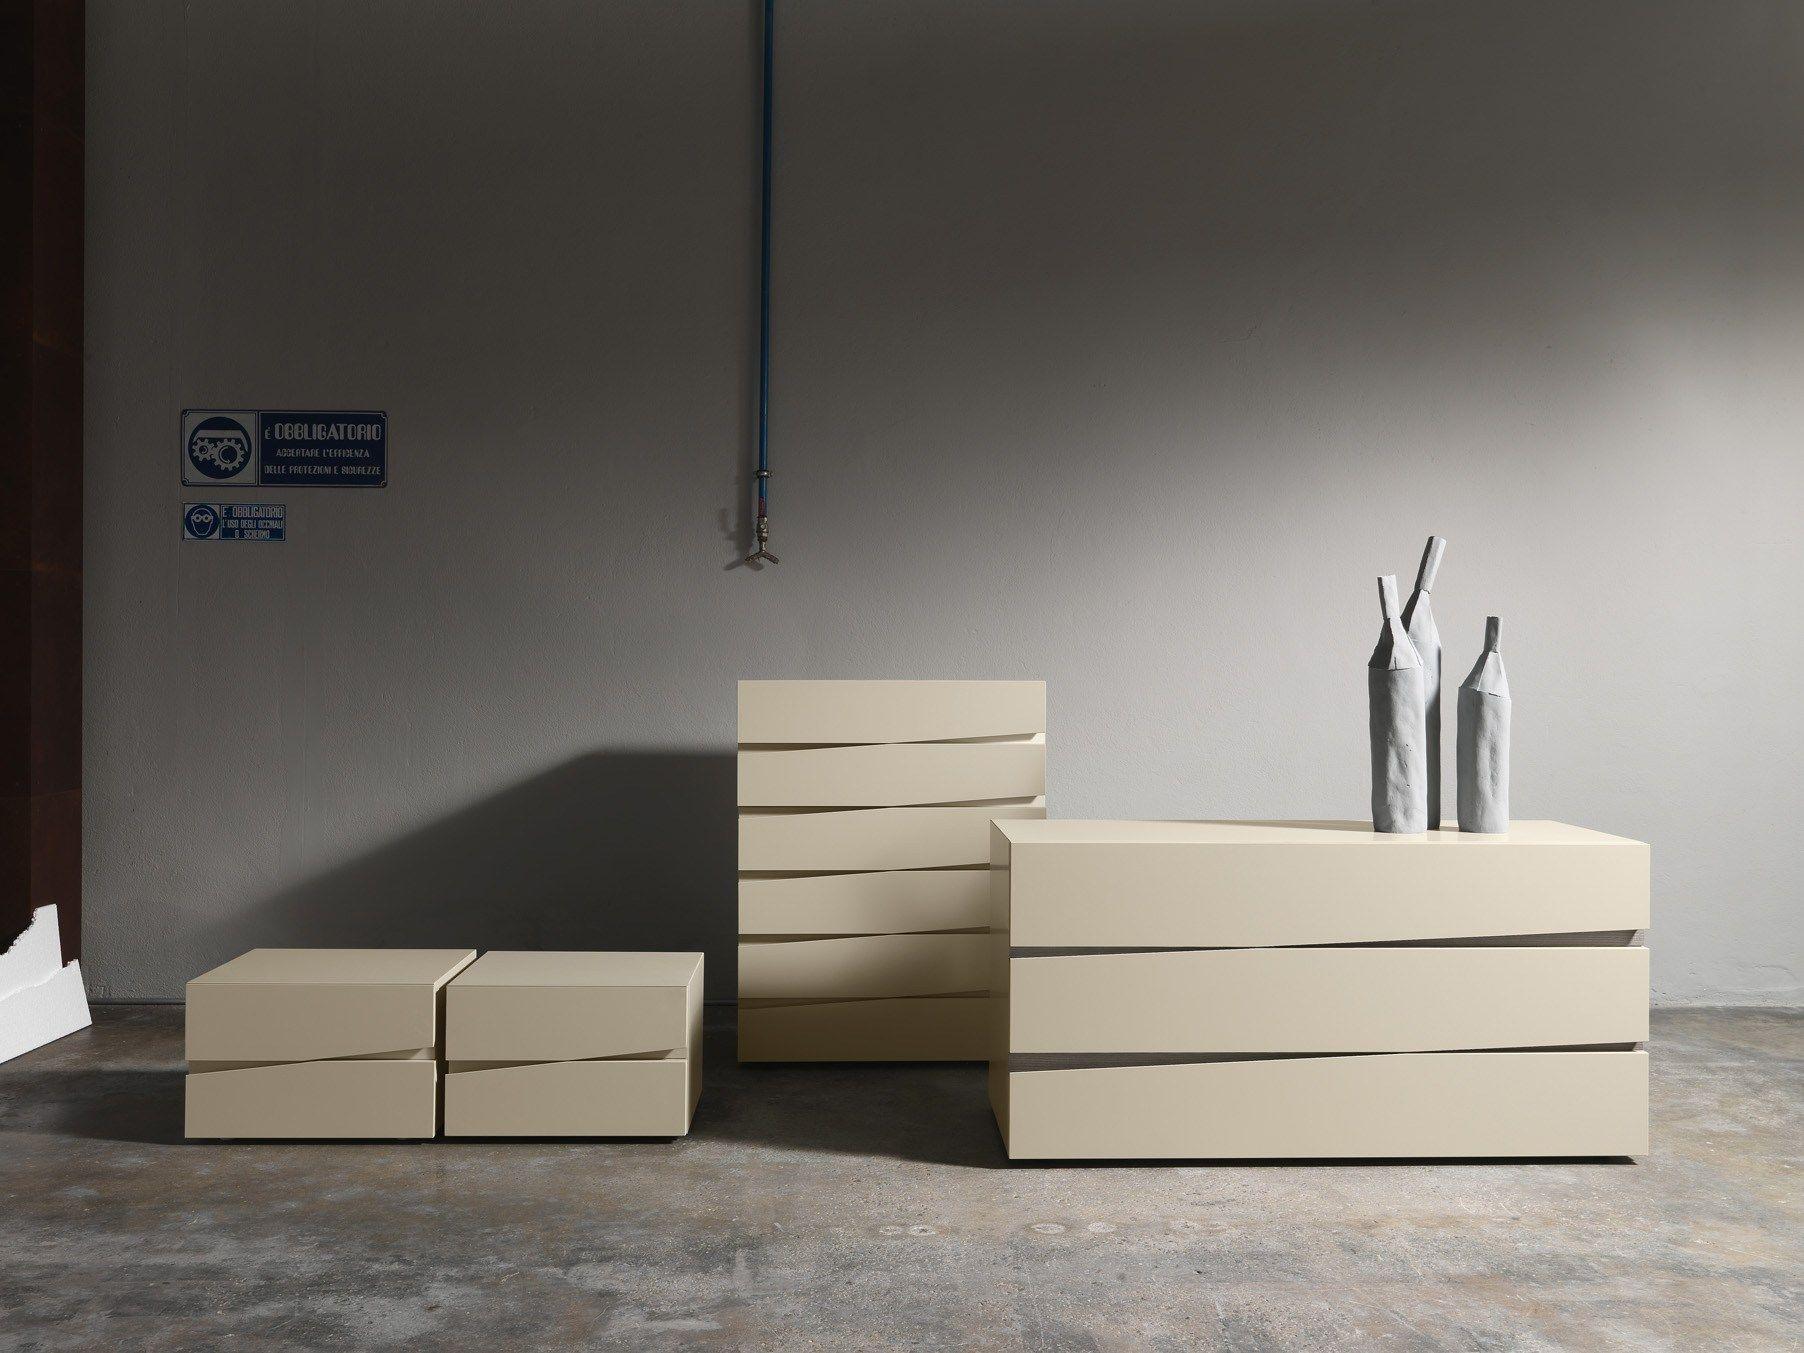 Jazz comodino by presotto industrie mobili design claudio lovadina - Mobili stile moderno ...